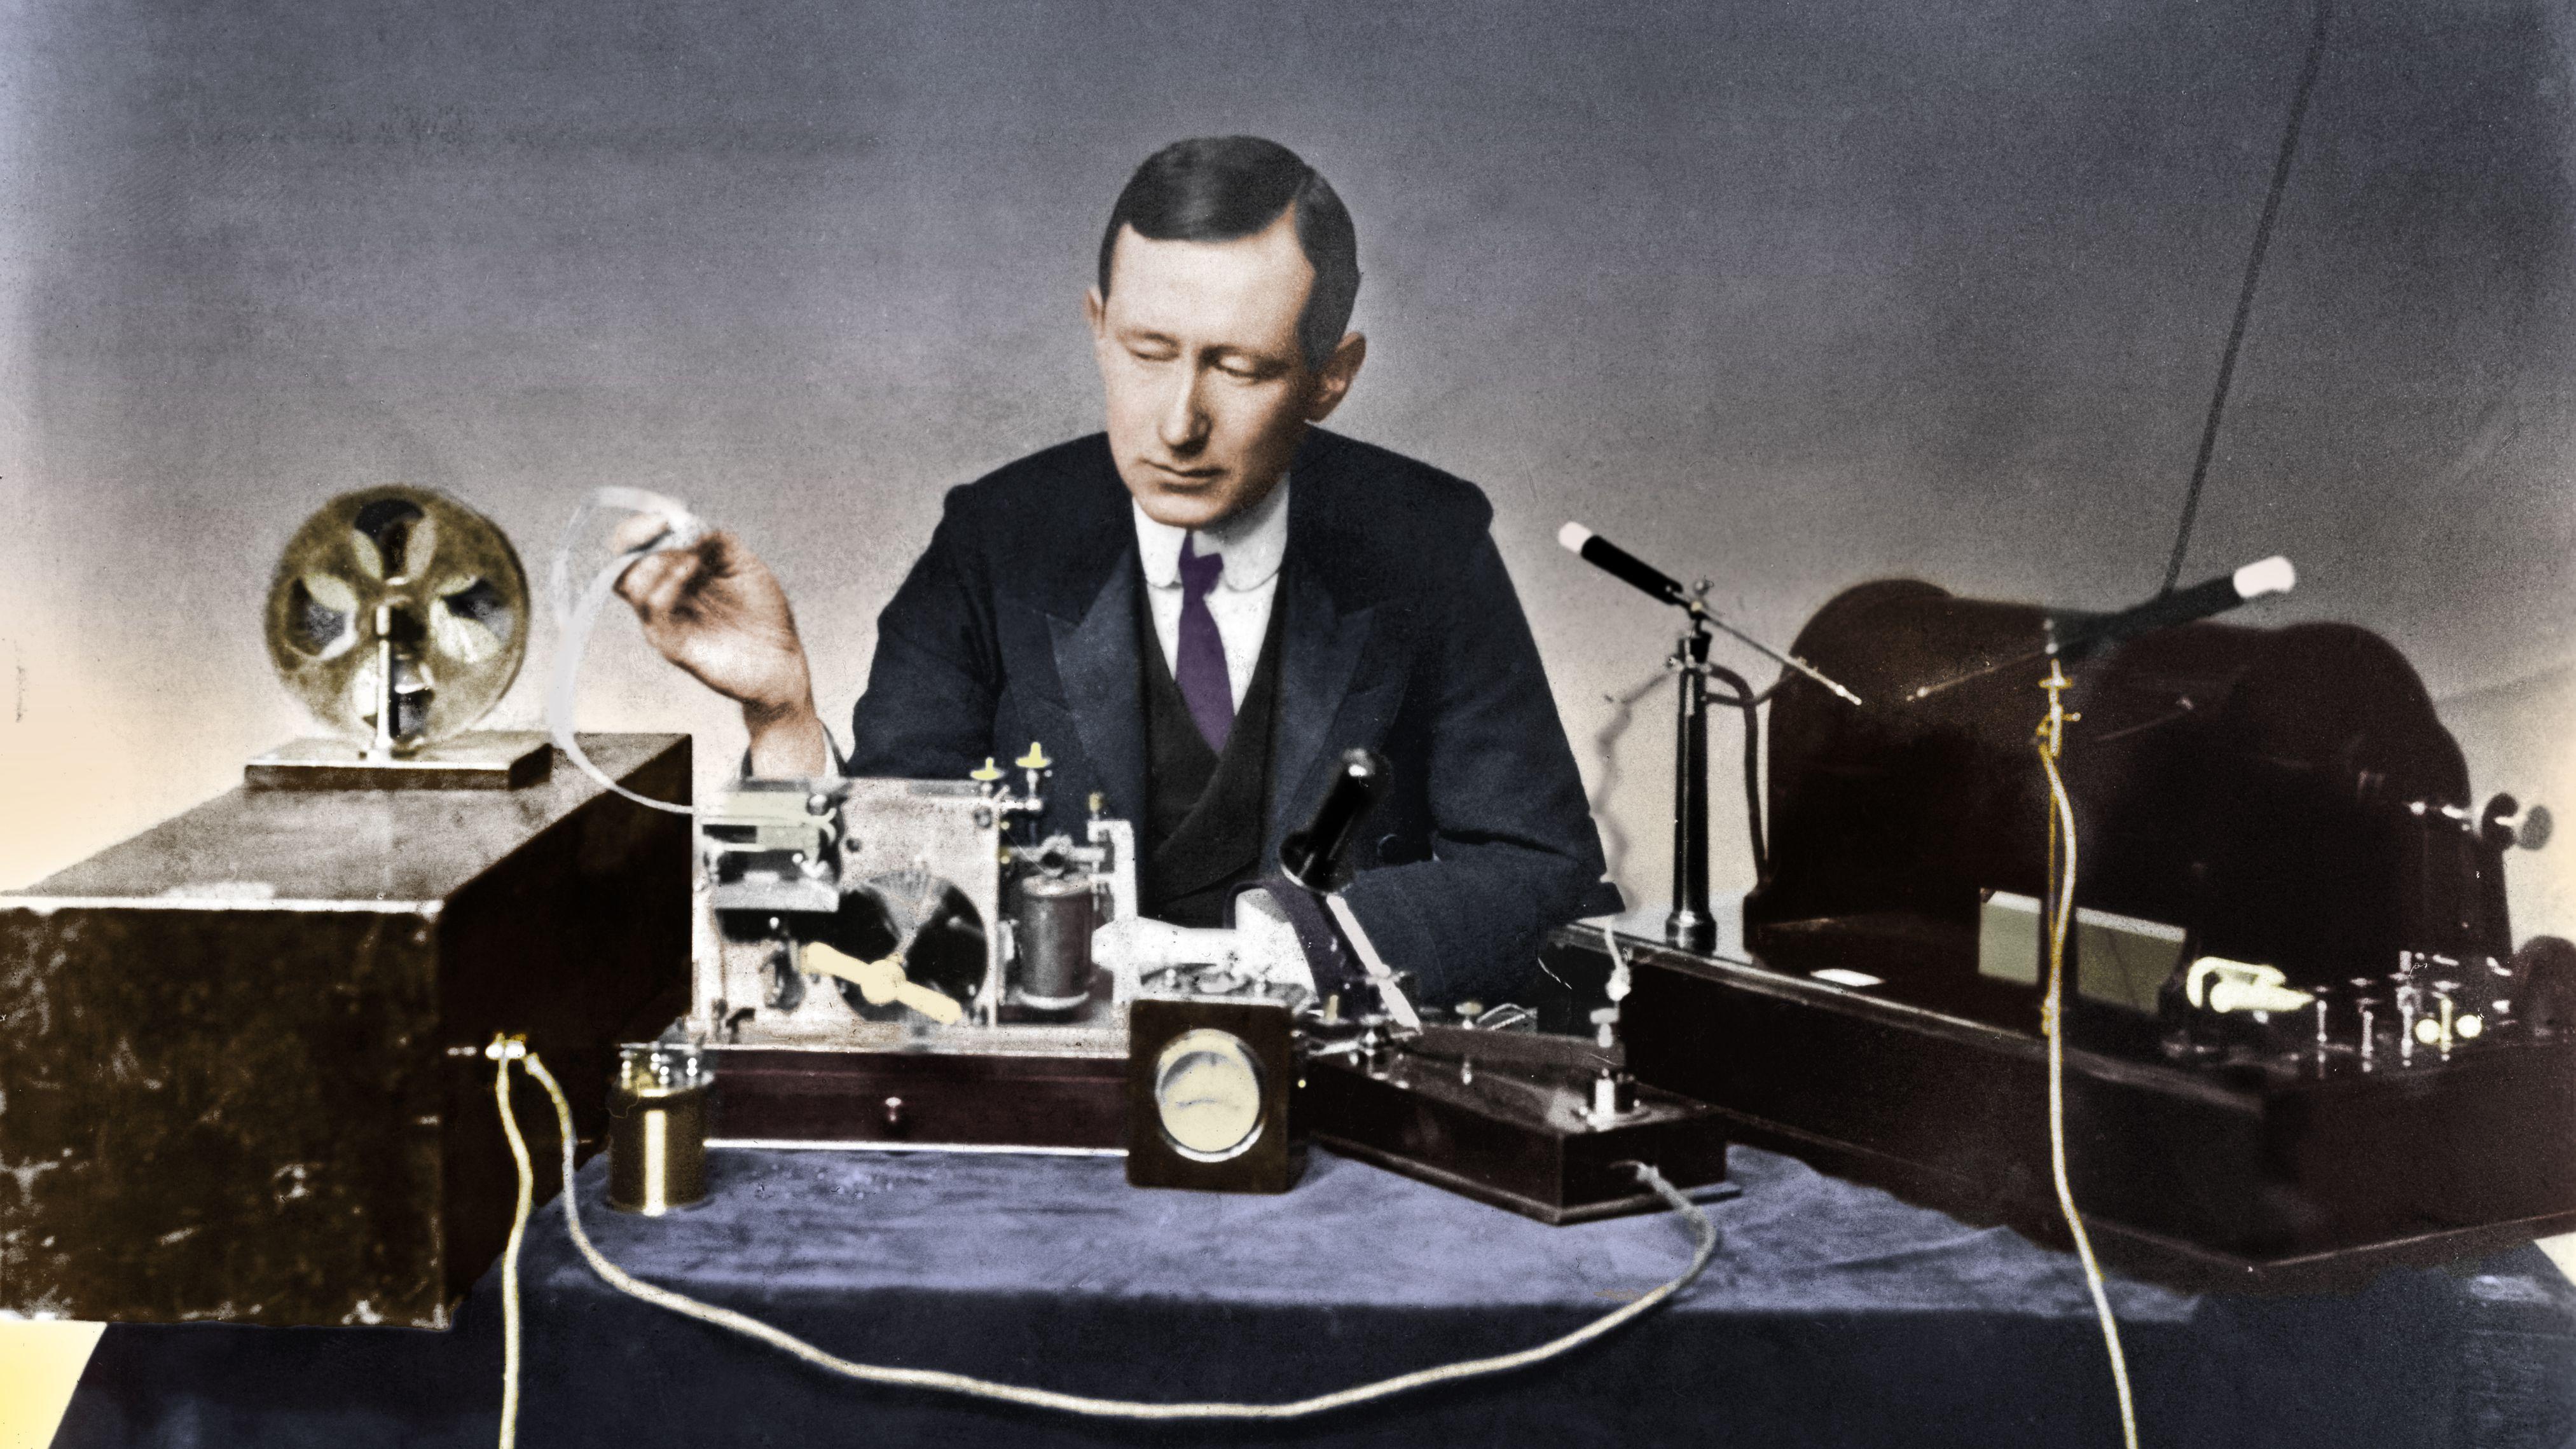 Biography of Guglielmo Marconi, Italian Inventor